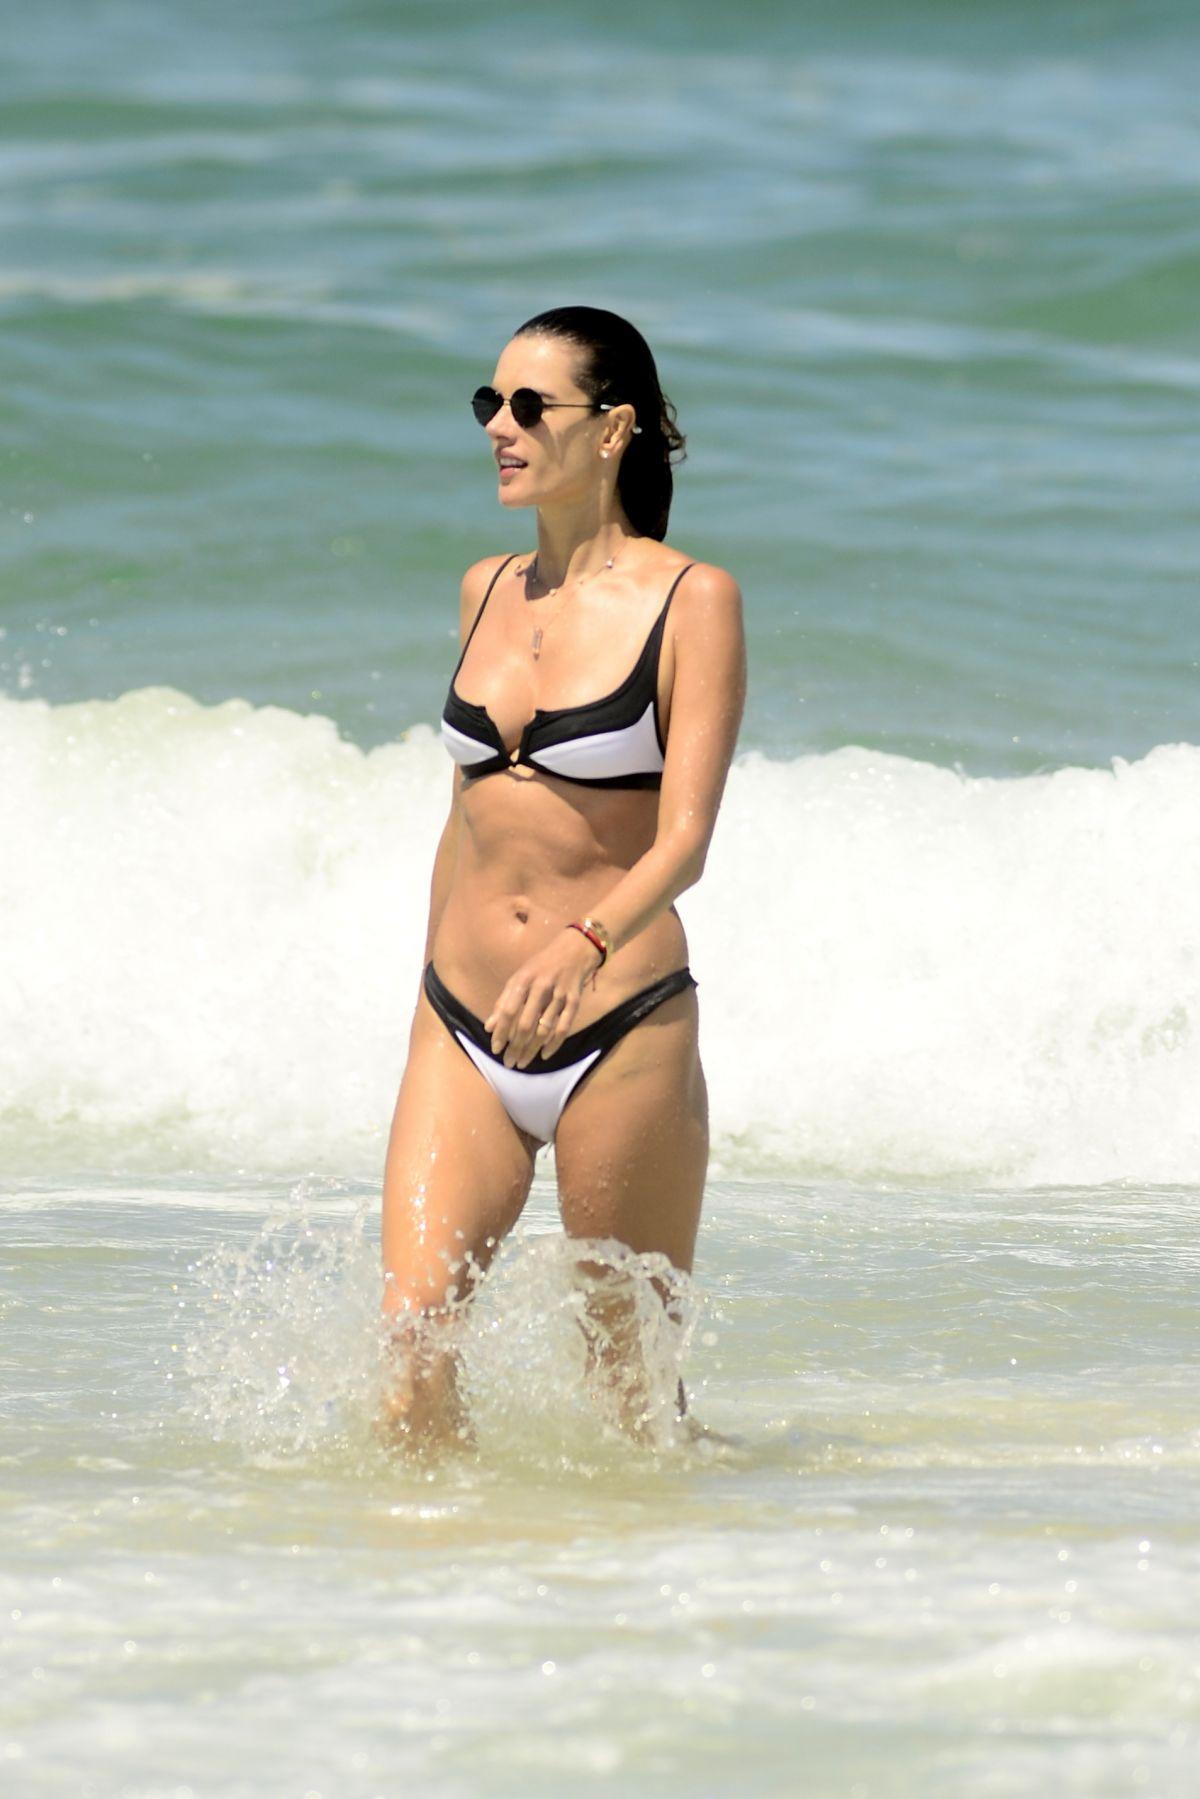 Alessandra Ambrosio in a Bikini - 27 Photos - 2019 year